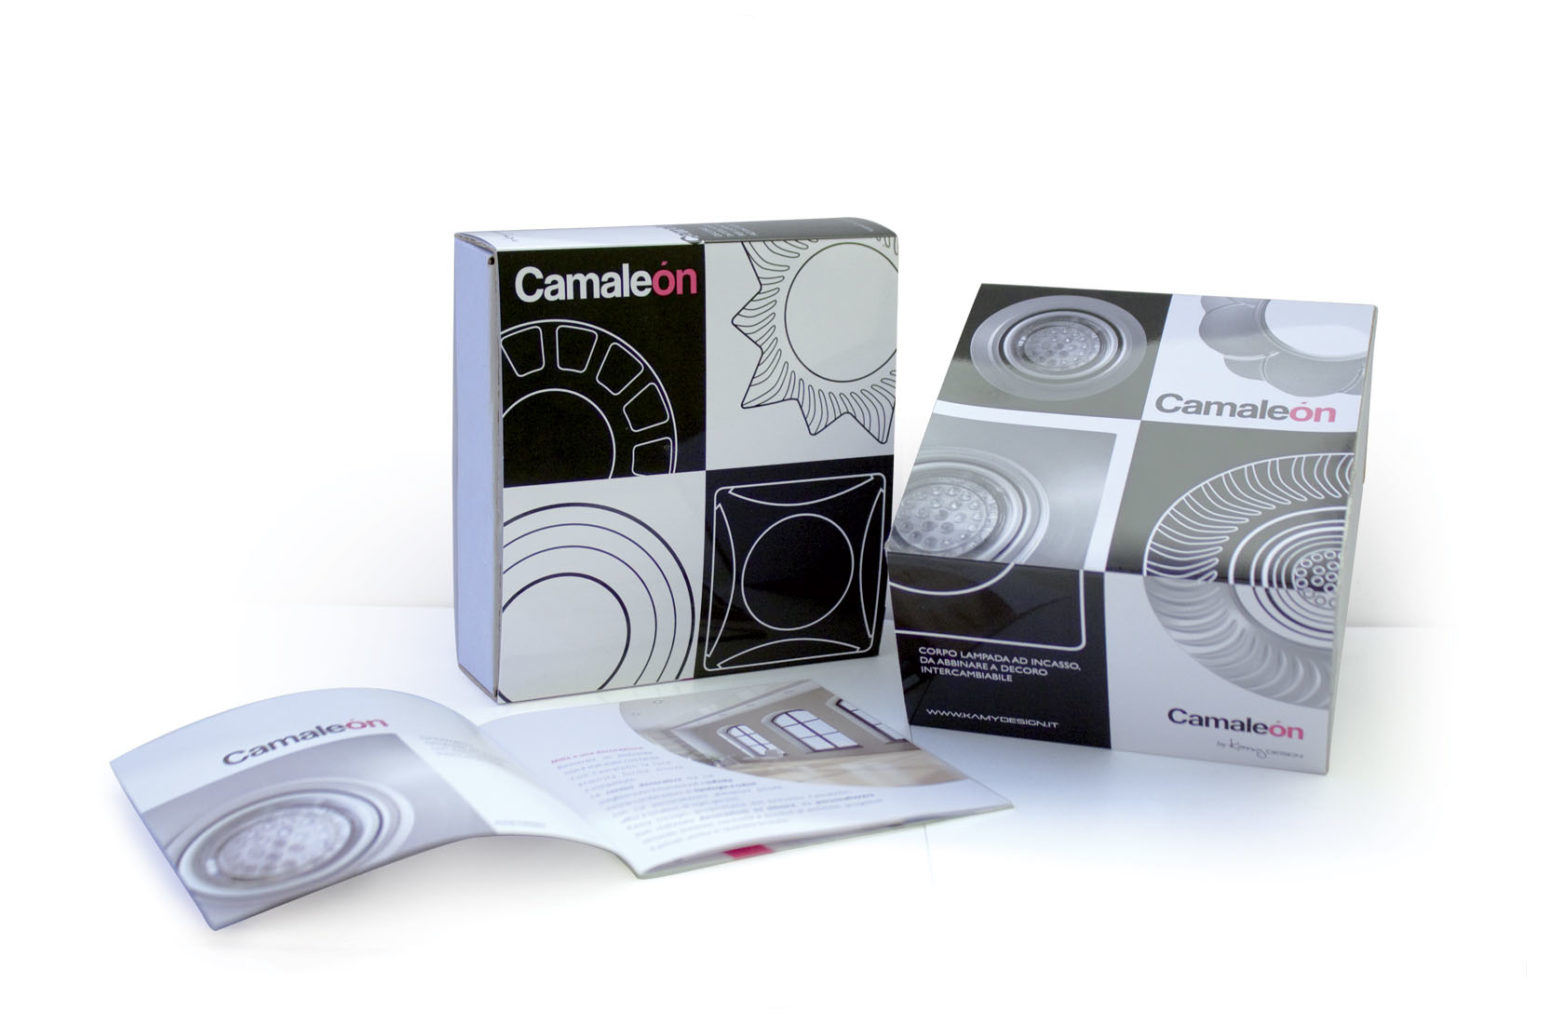 Absolut-Camaleon-Espressioni-di-design